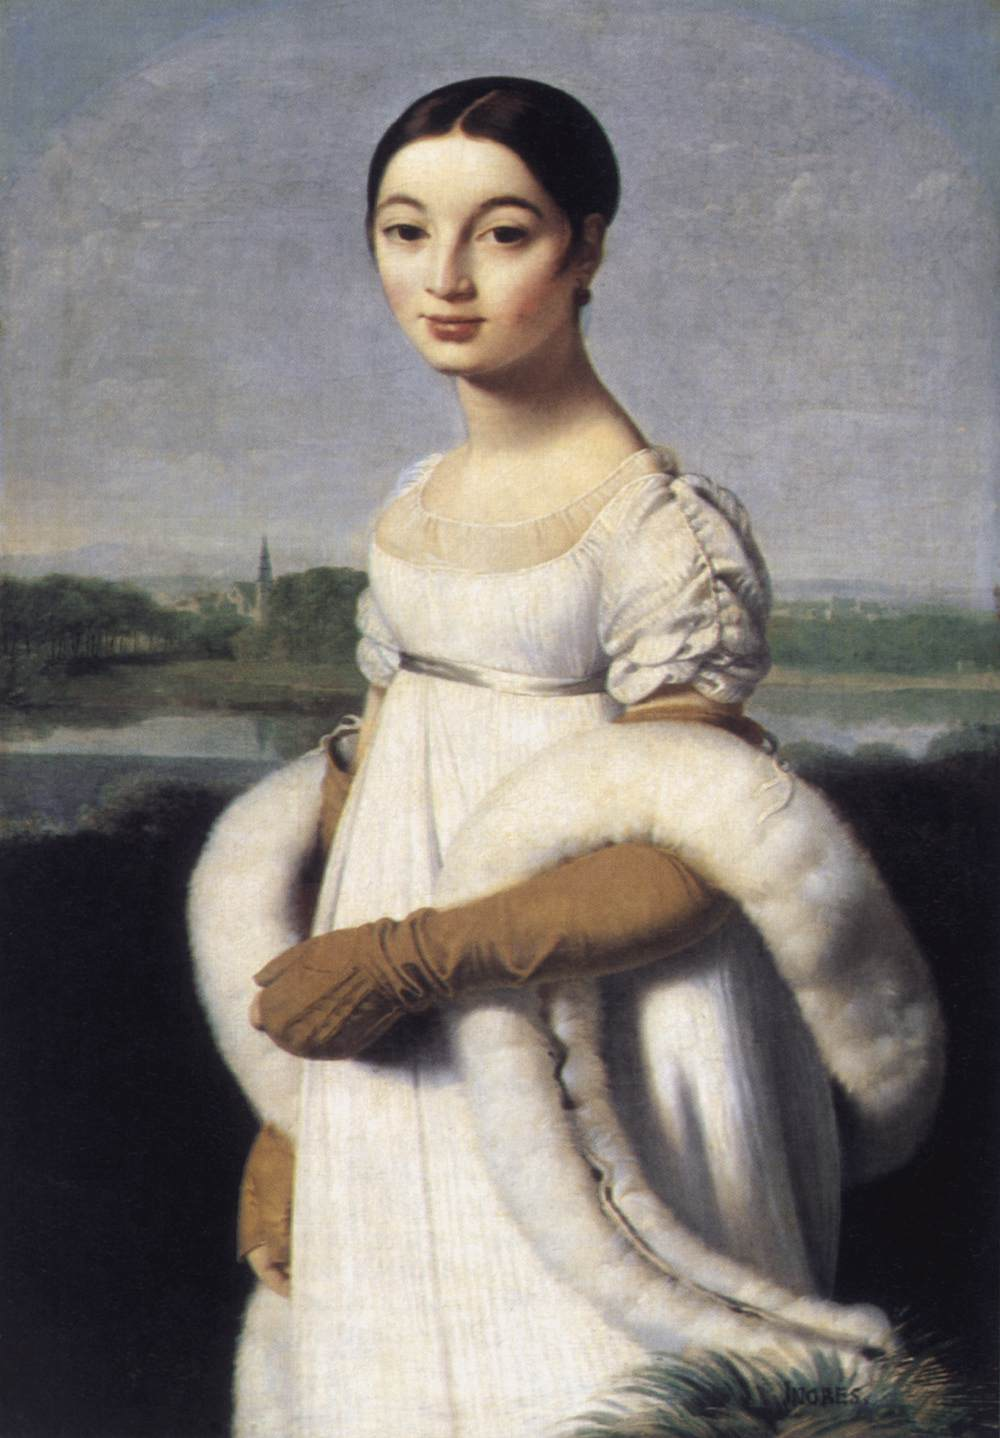 Jean-Auguste-Dominique Ingres ritrattista